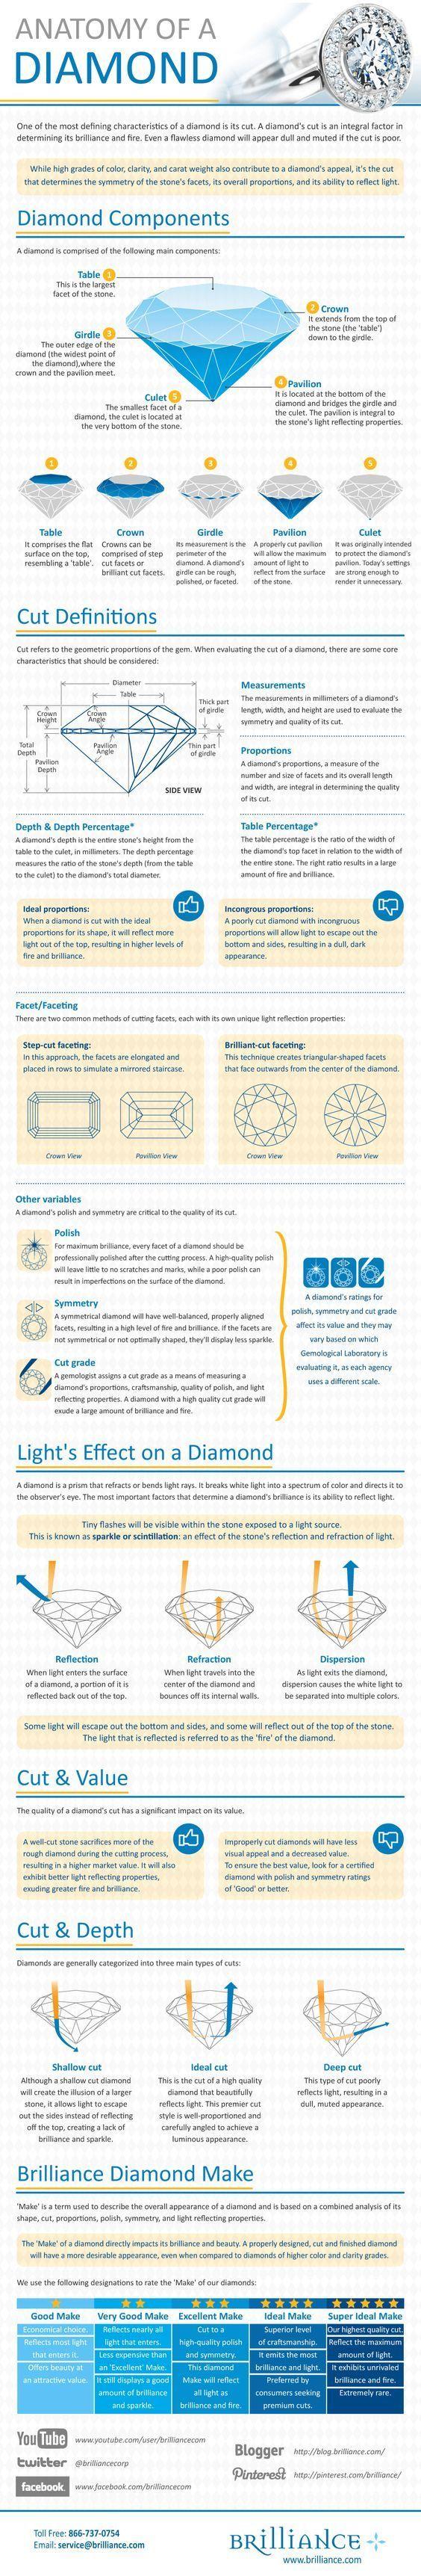 loose Diamonds : Anatomia de um diamante | Geología | Pinterest ...